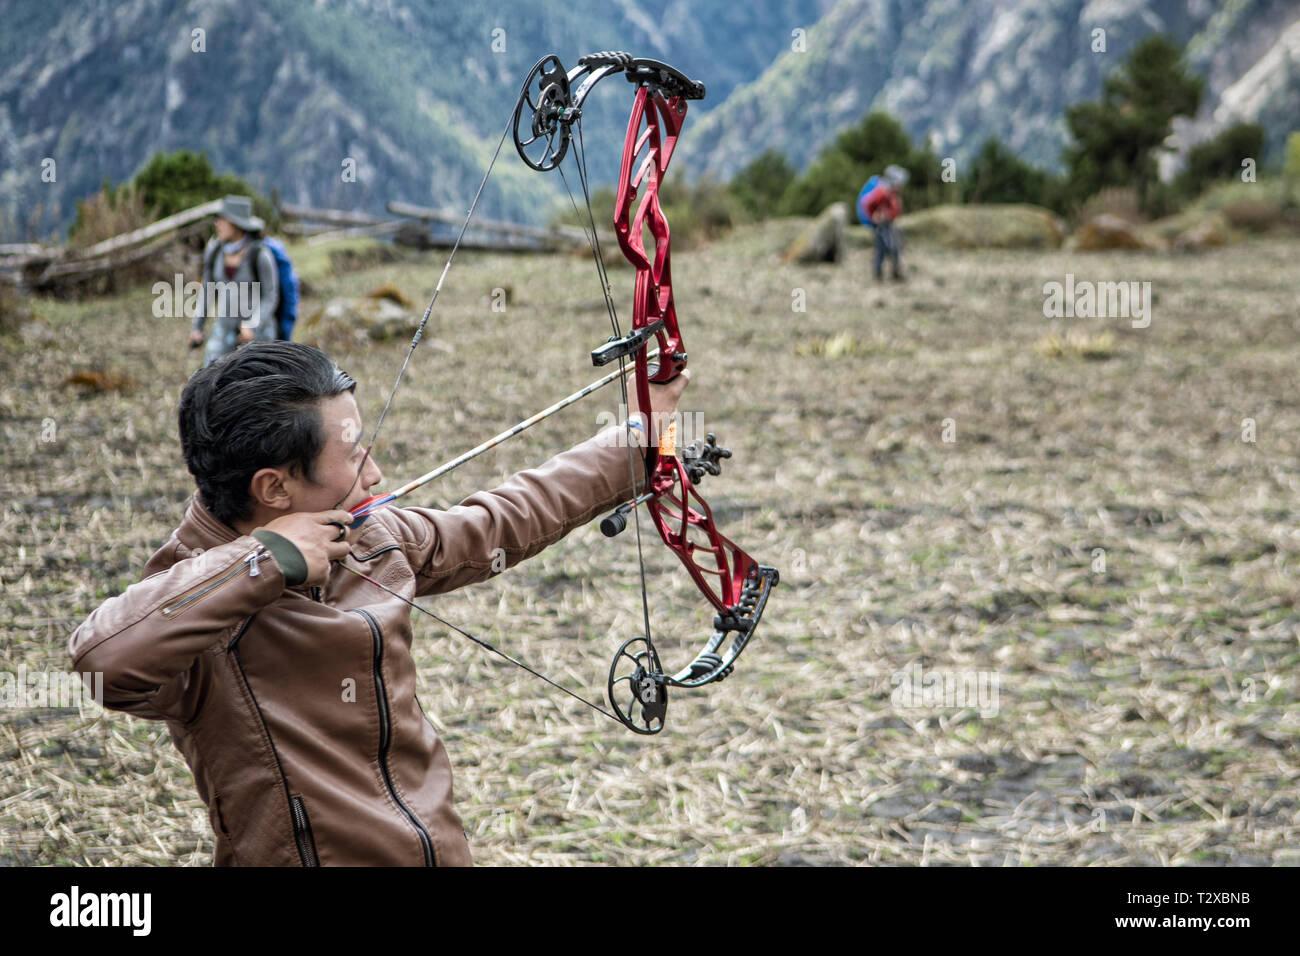 Archery in the village of Woche, Gasa District, Snowman Trek, Bhutan Stock Photo